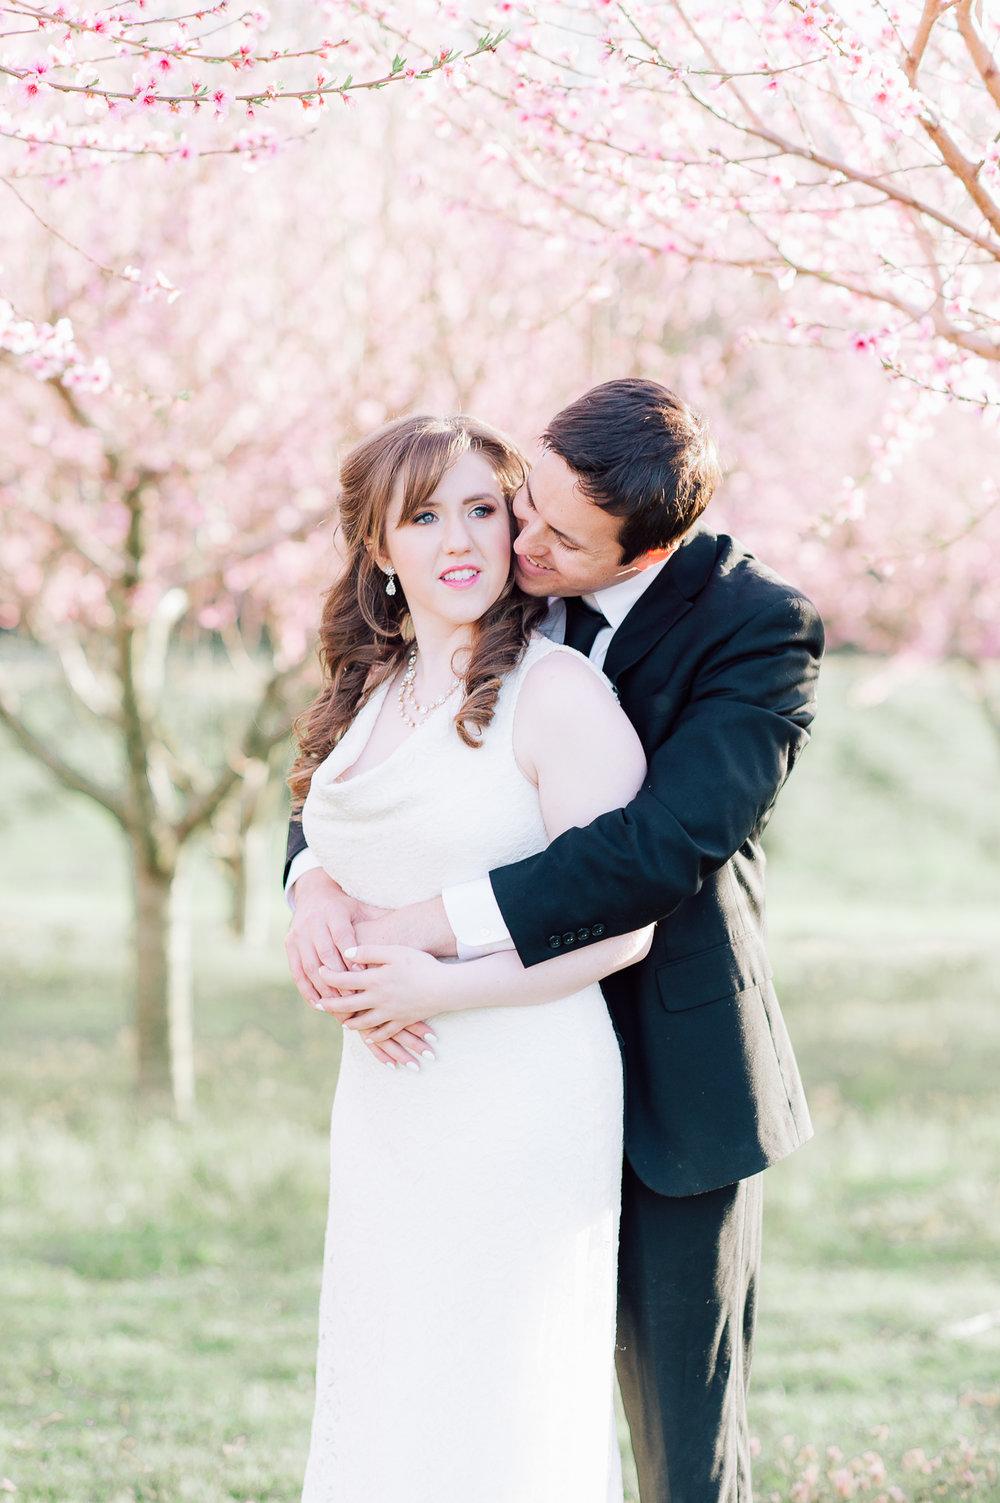 springwedding_cherryblossoms_virginiaphotographer_youseephotography_styledshoot (546).jpg